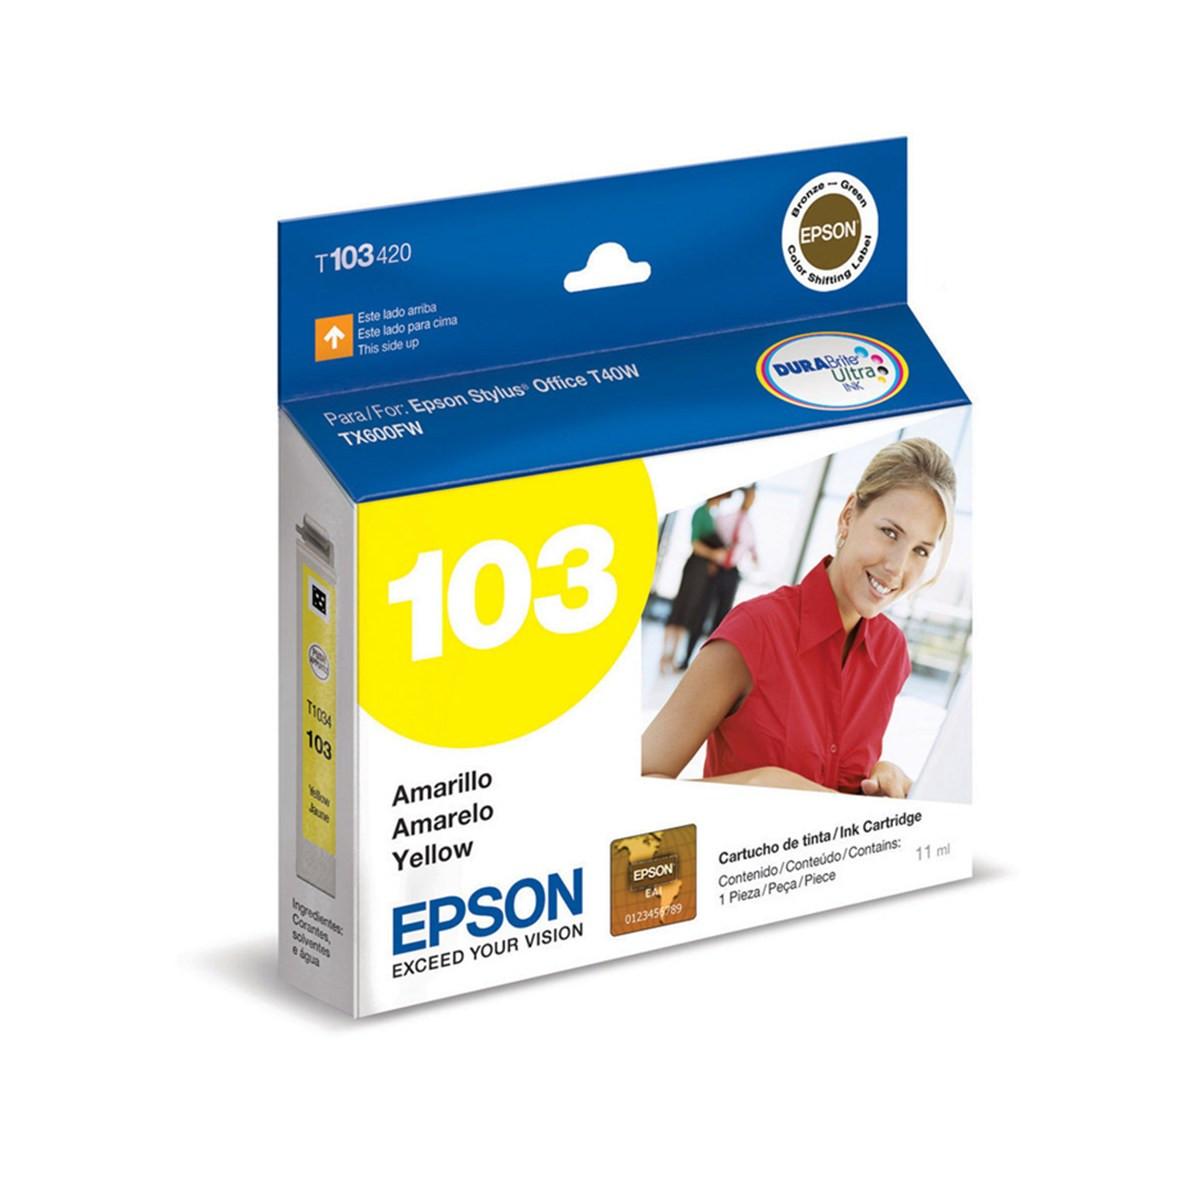 Cartucho de Tinta Epson T103420 T1034 T103 | Amarelo T1110 TX515FN TX600FW TX550W T40W Original 11ml